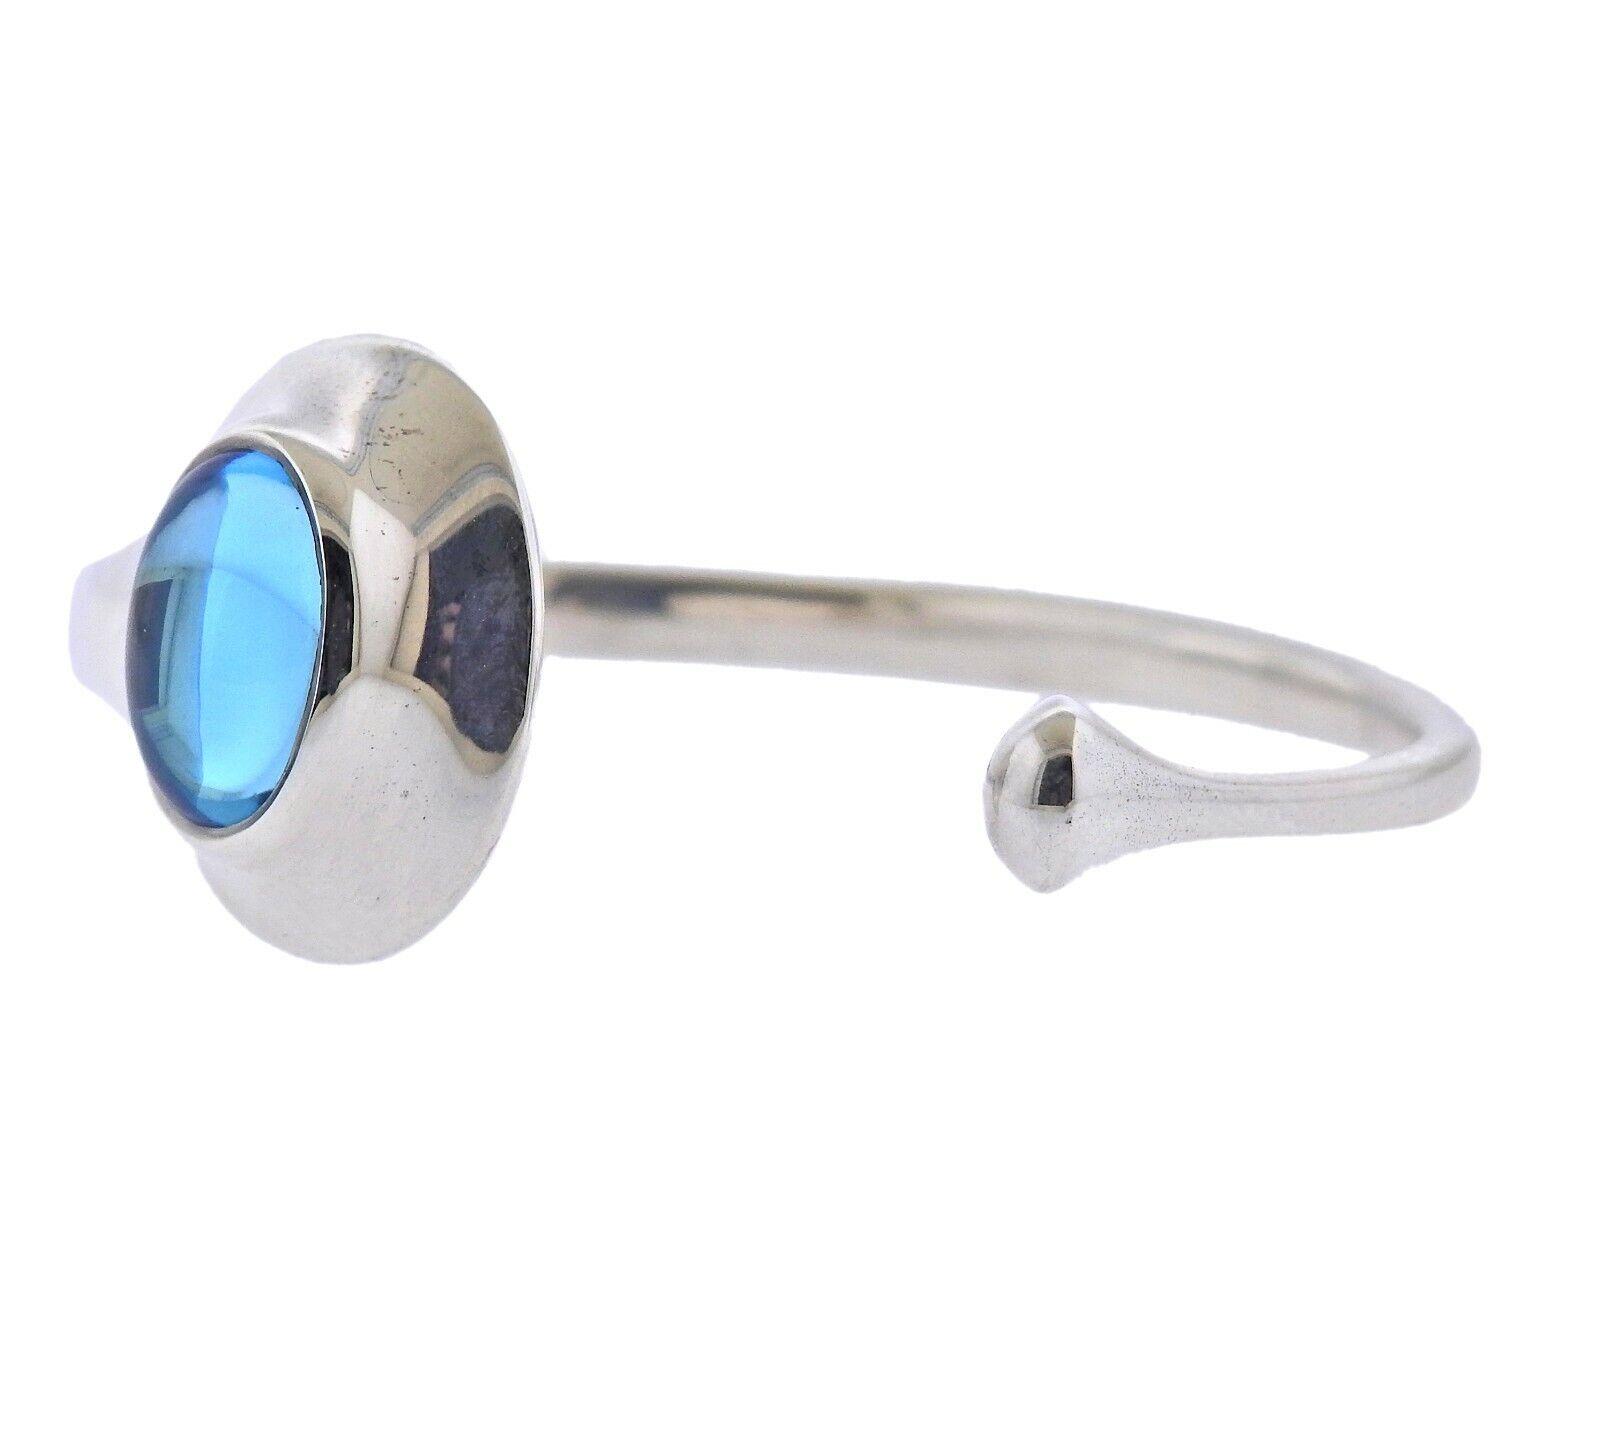 New Georg Jensen Vivianna Blue Topaz Silver Bracelet 269 Small - $680.00